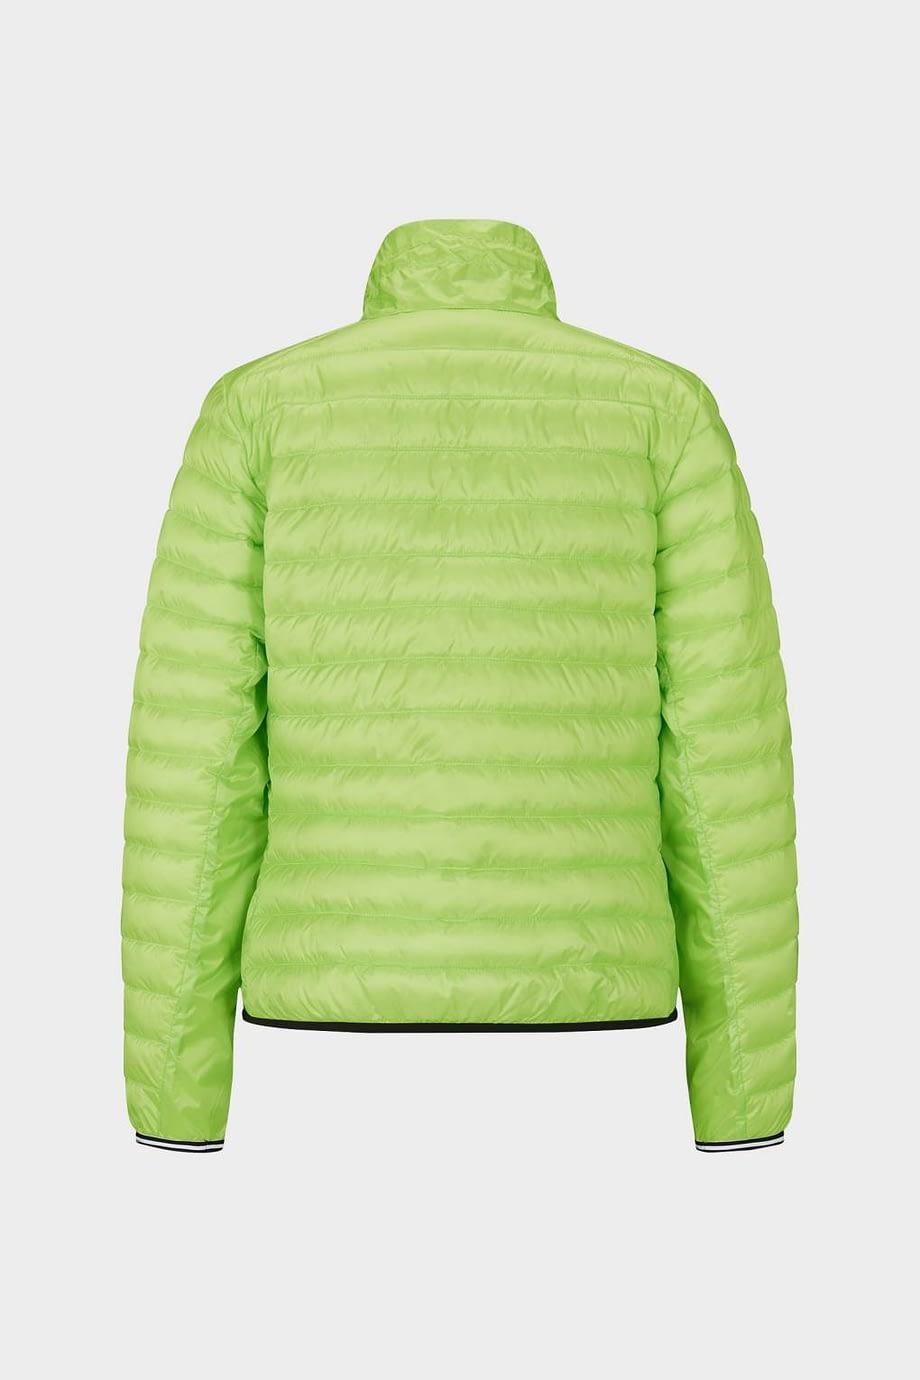 MASHA-QUILTED-JACKET-green6